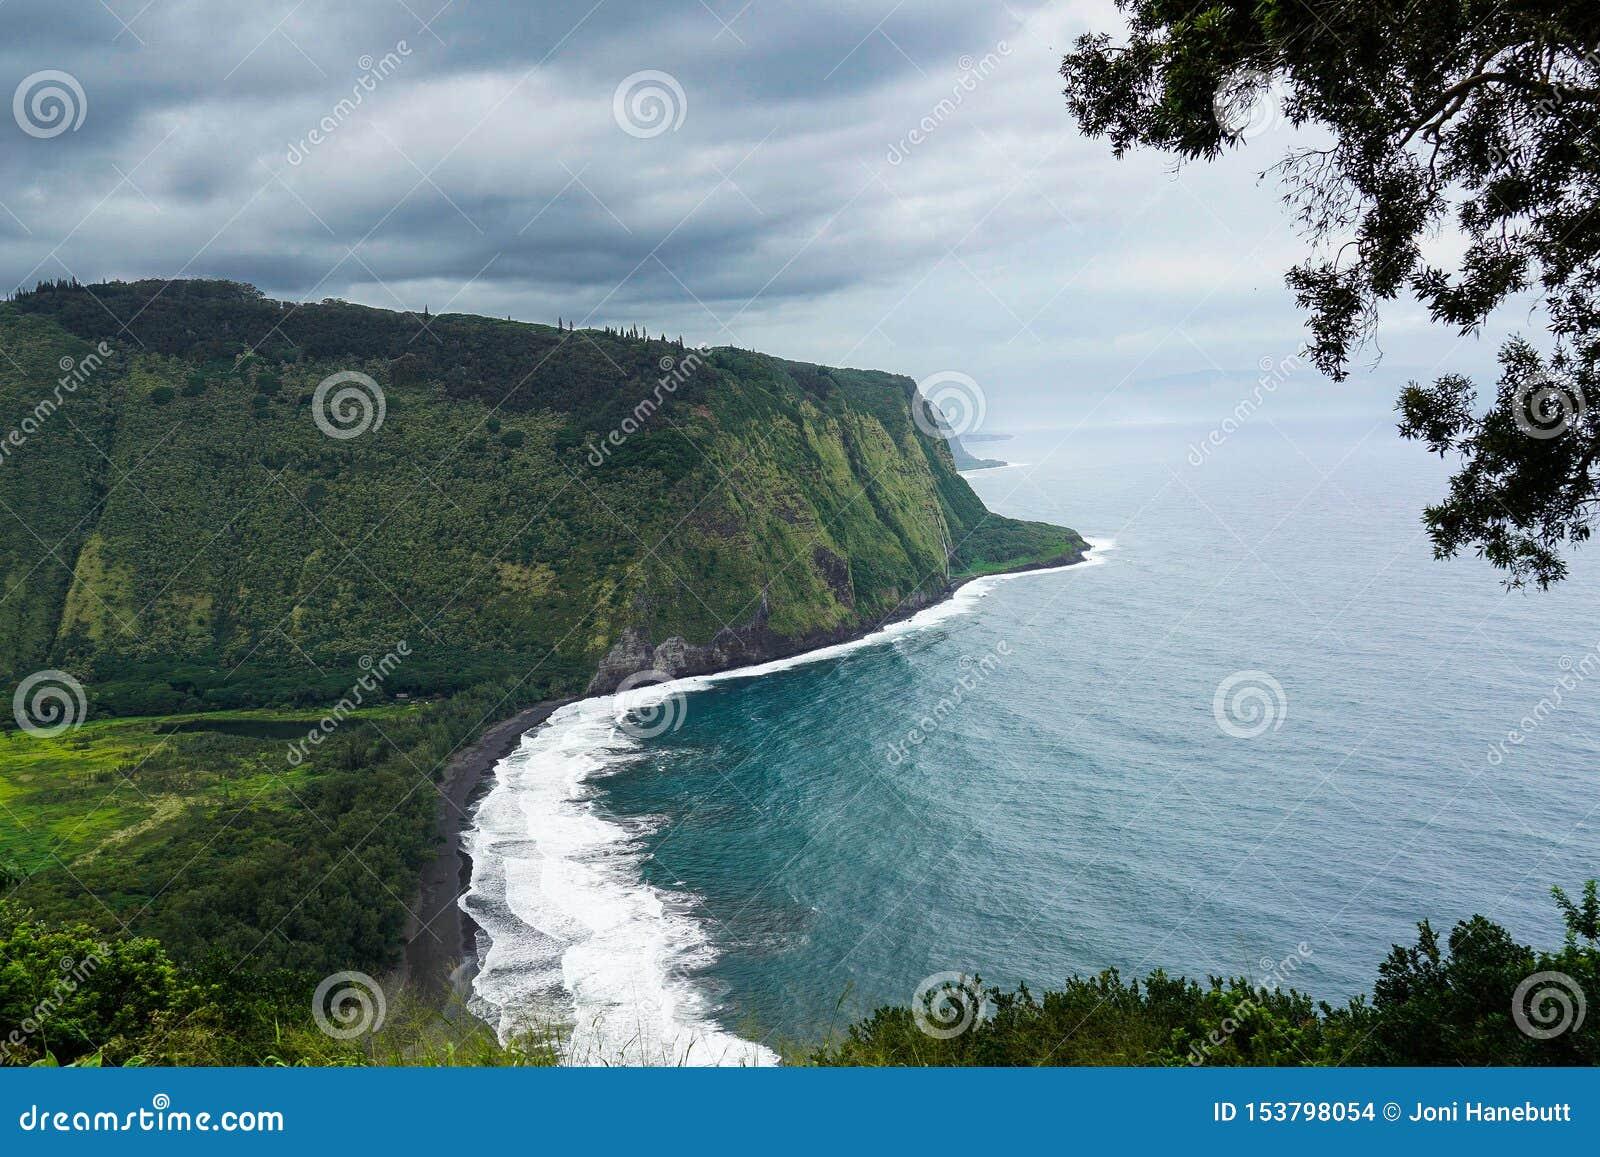 Big Island of Hawaii Wiapio Valley Overlook